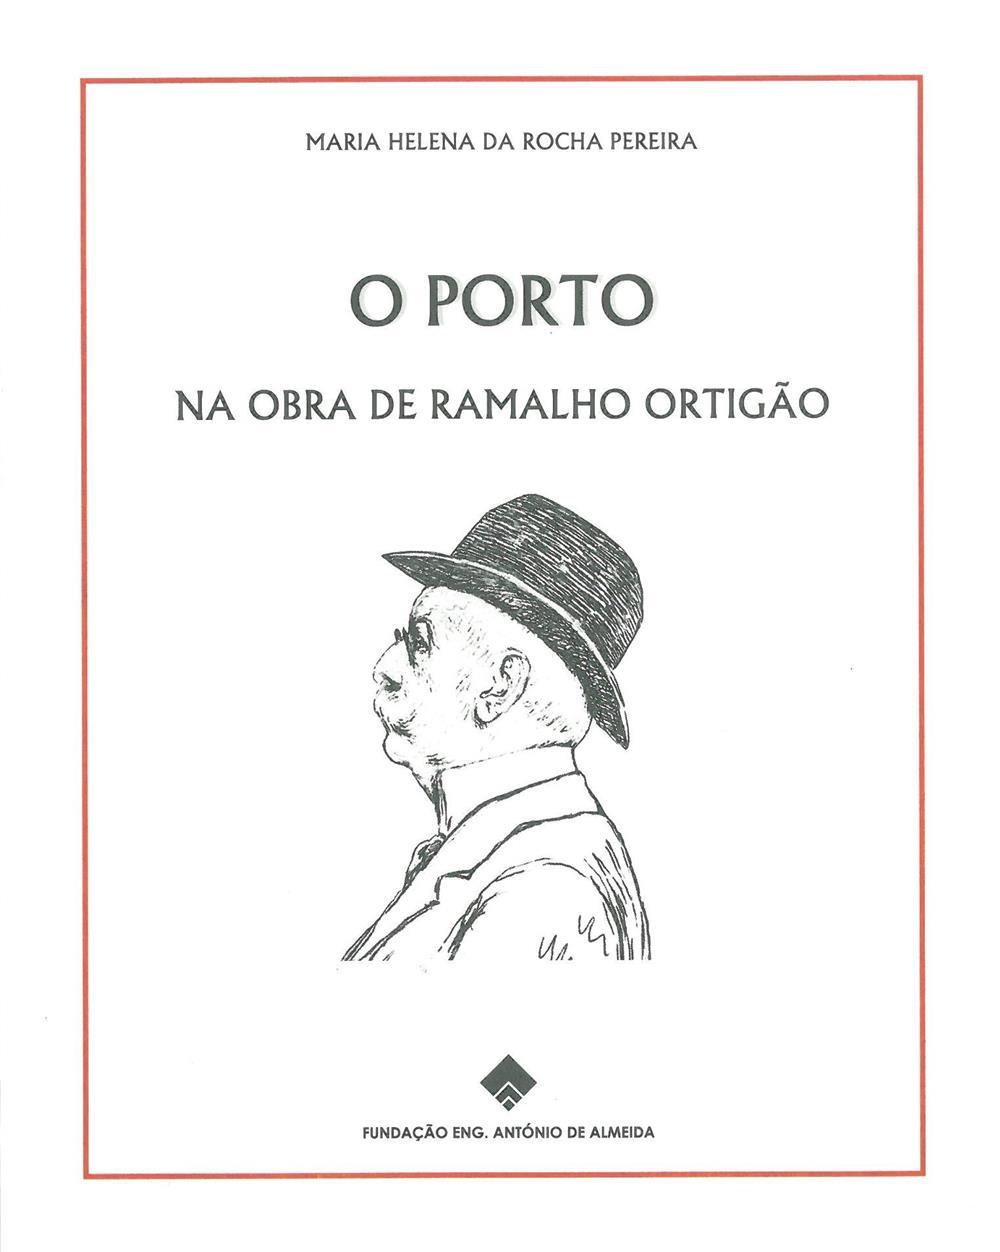 O Porto na obra de Ramalho Ortigão_.jpg